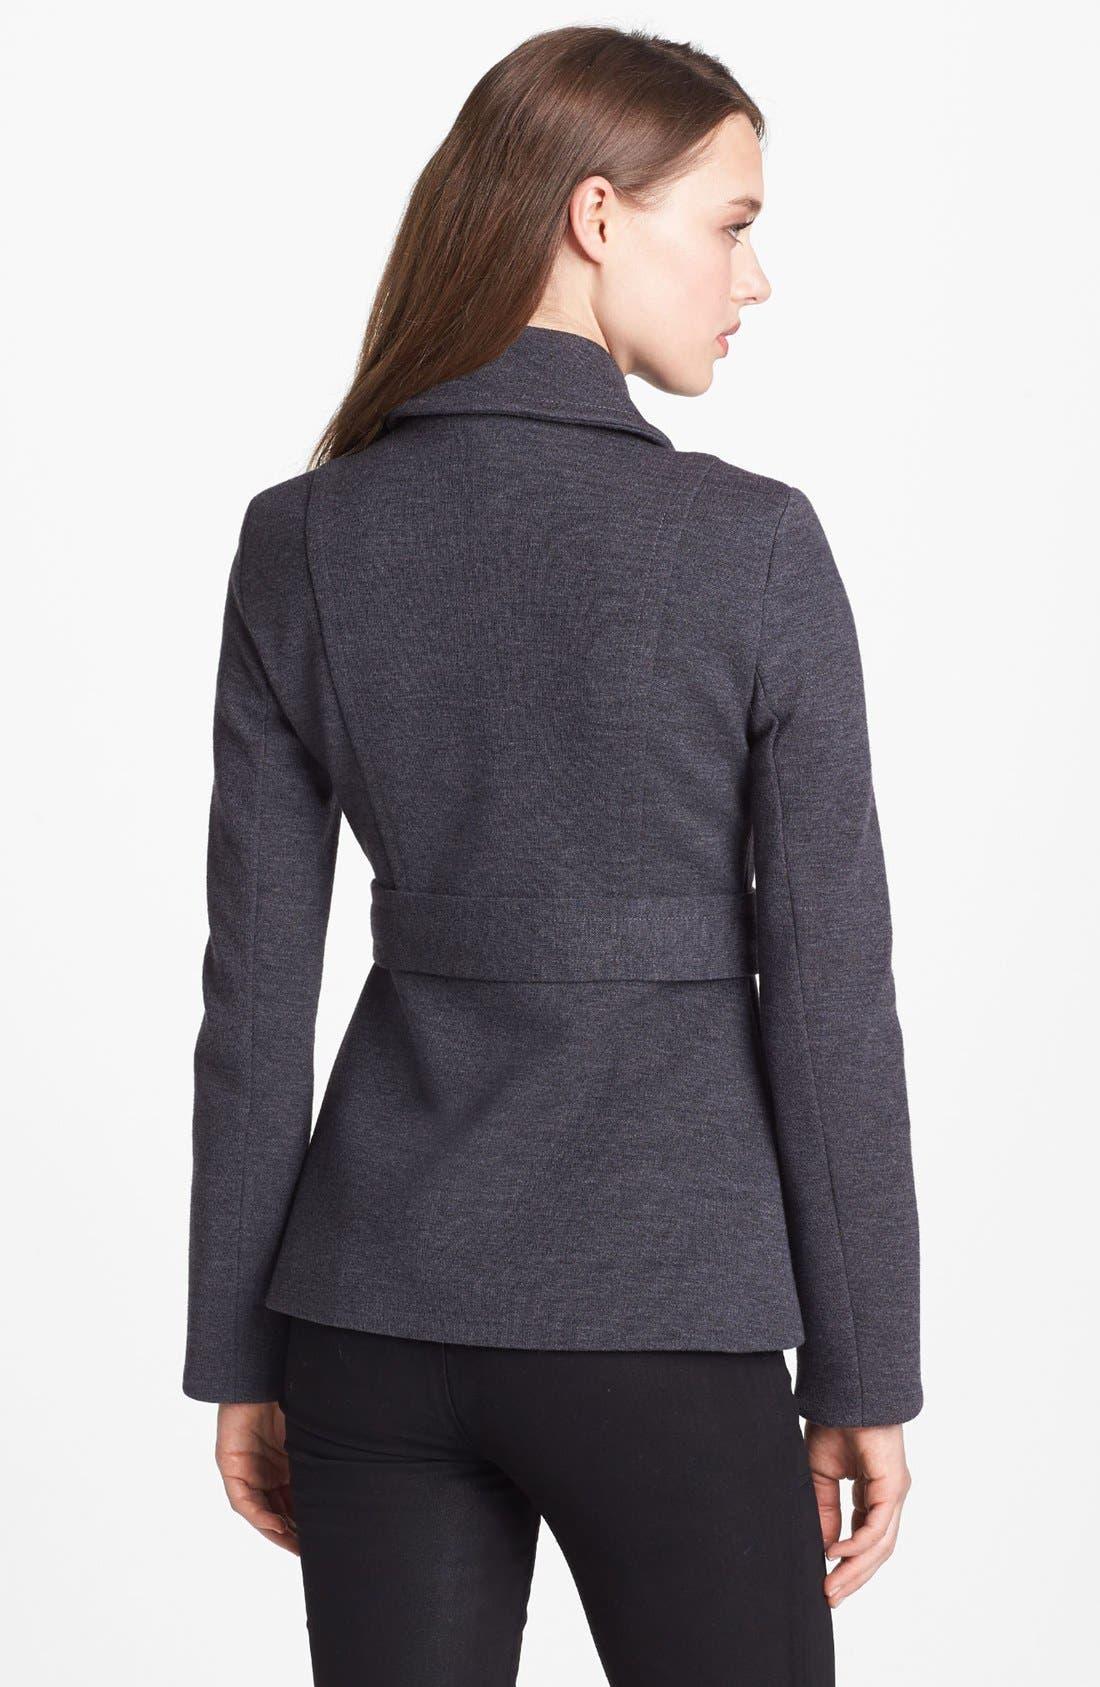 'Milly Milano' Jacket,                             Alternate thumbnail 5, color,                             020